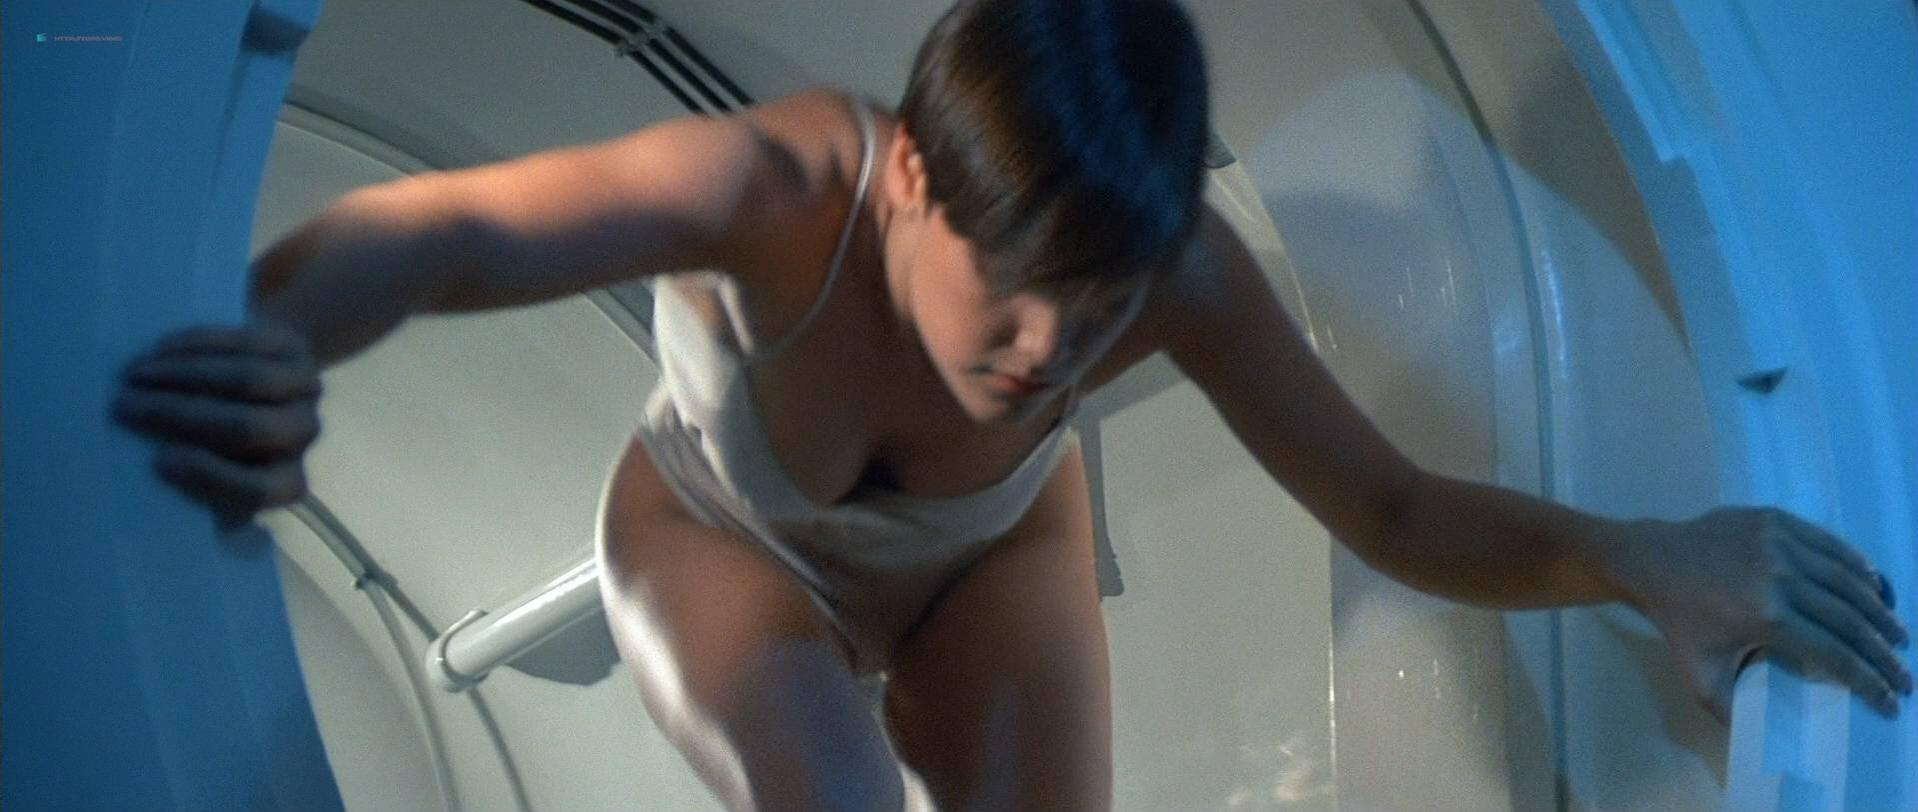 christie brinkley in the nude